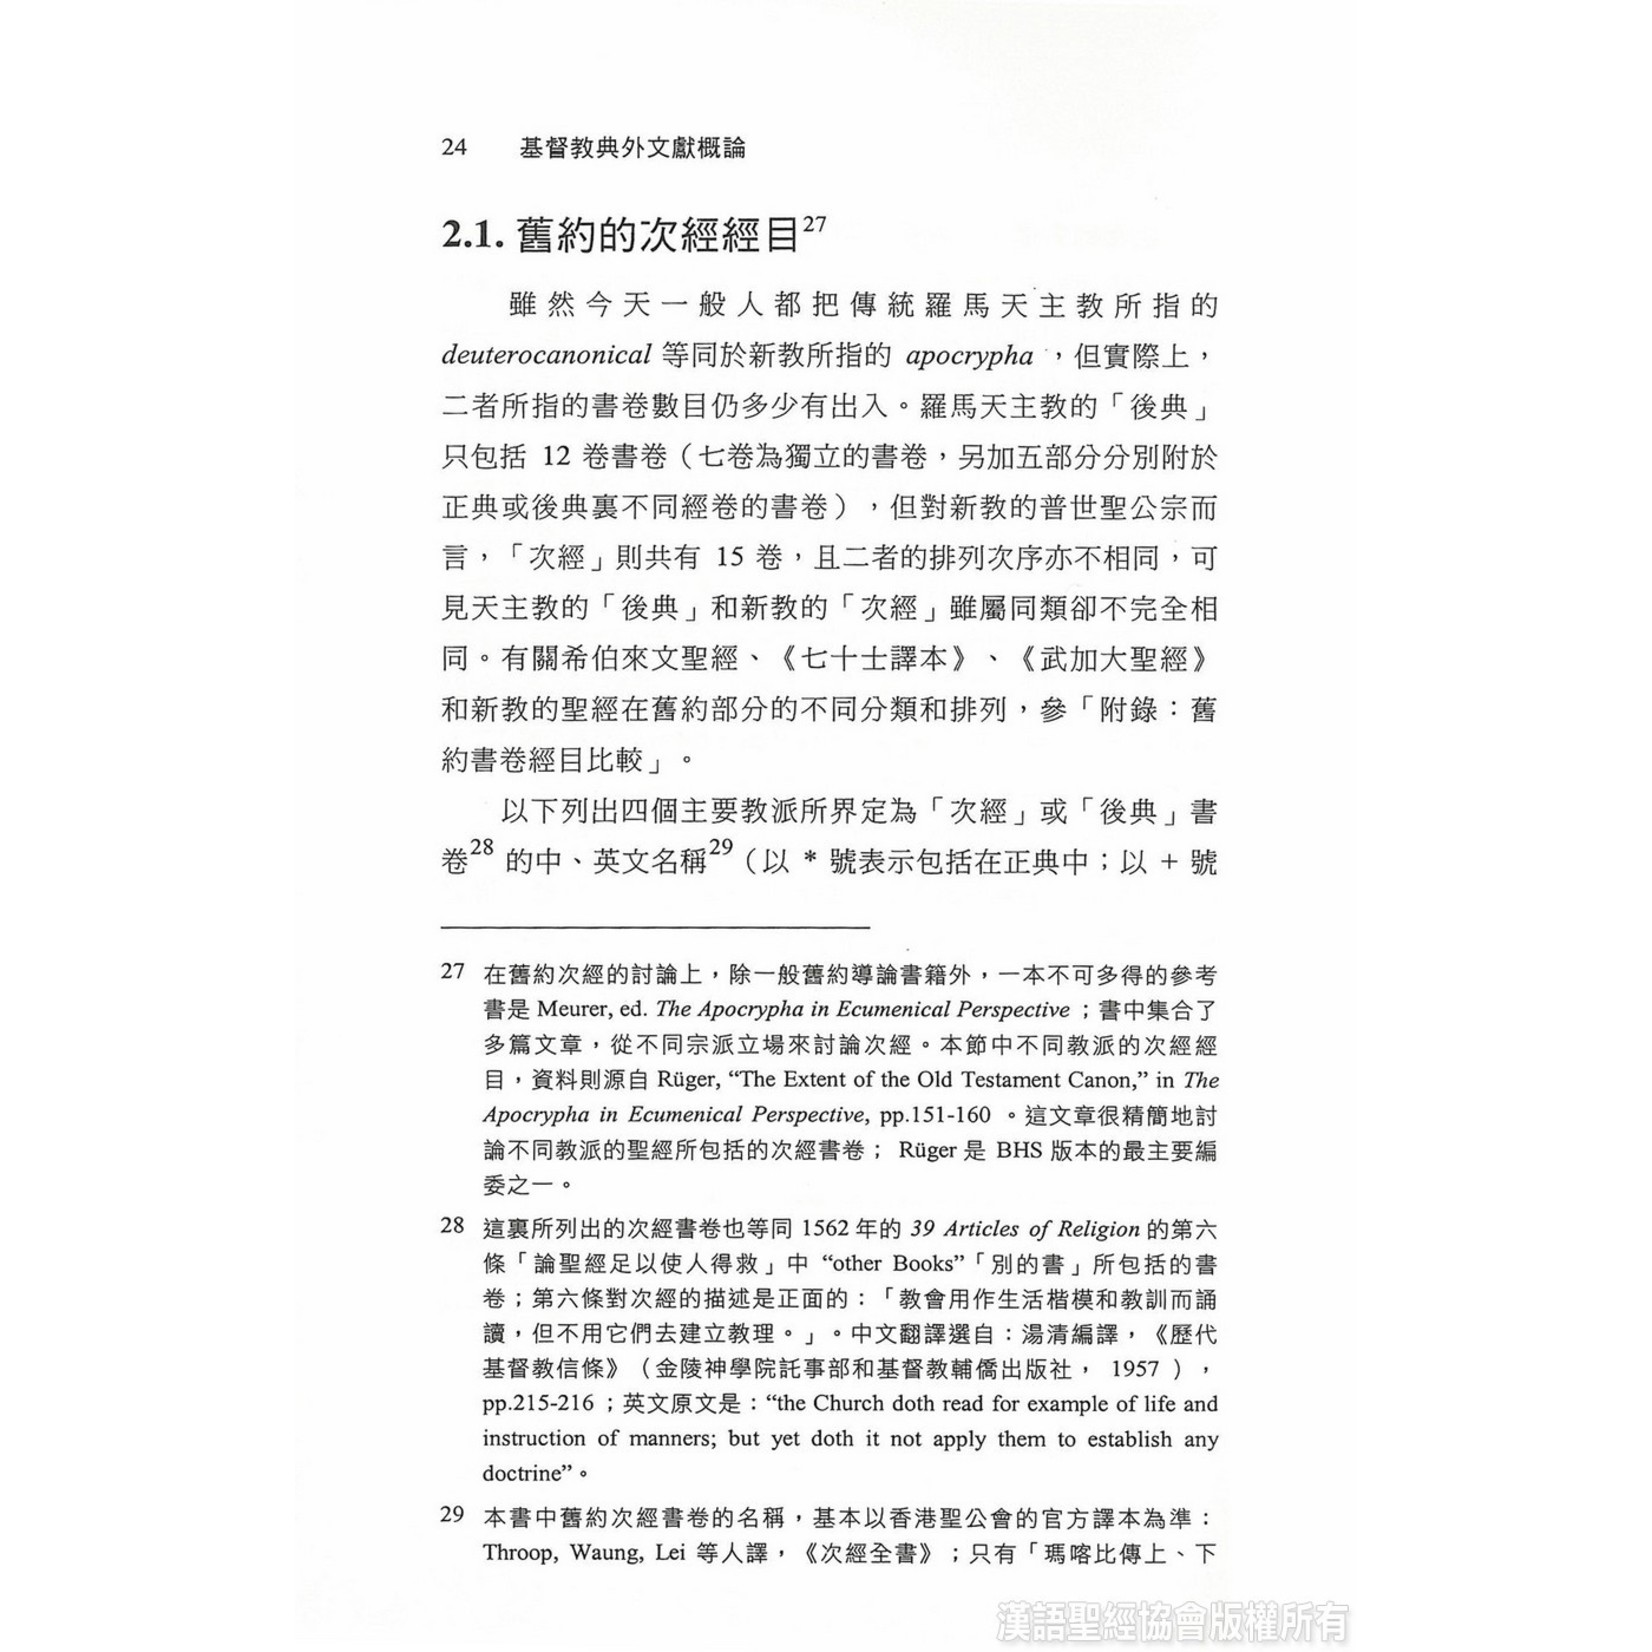 漢語聖經協會 Chinese Bible International 基督教典外文獻概論 An Introduction to Extracanonical Literature (Paperback)